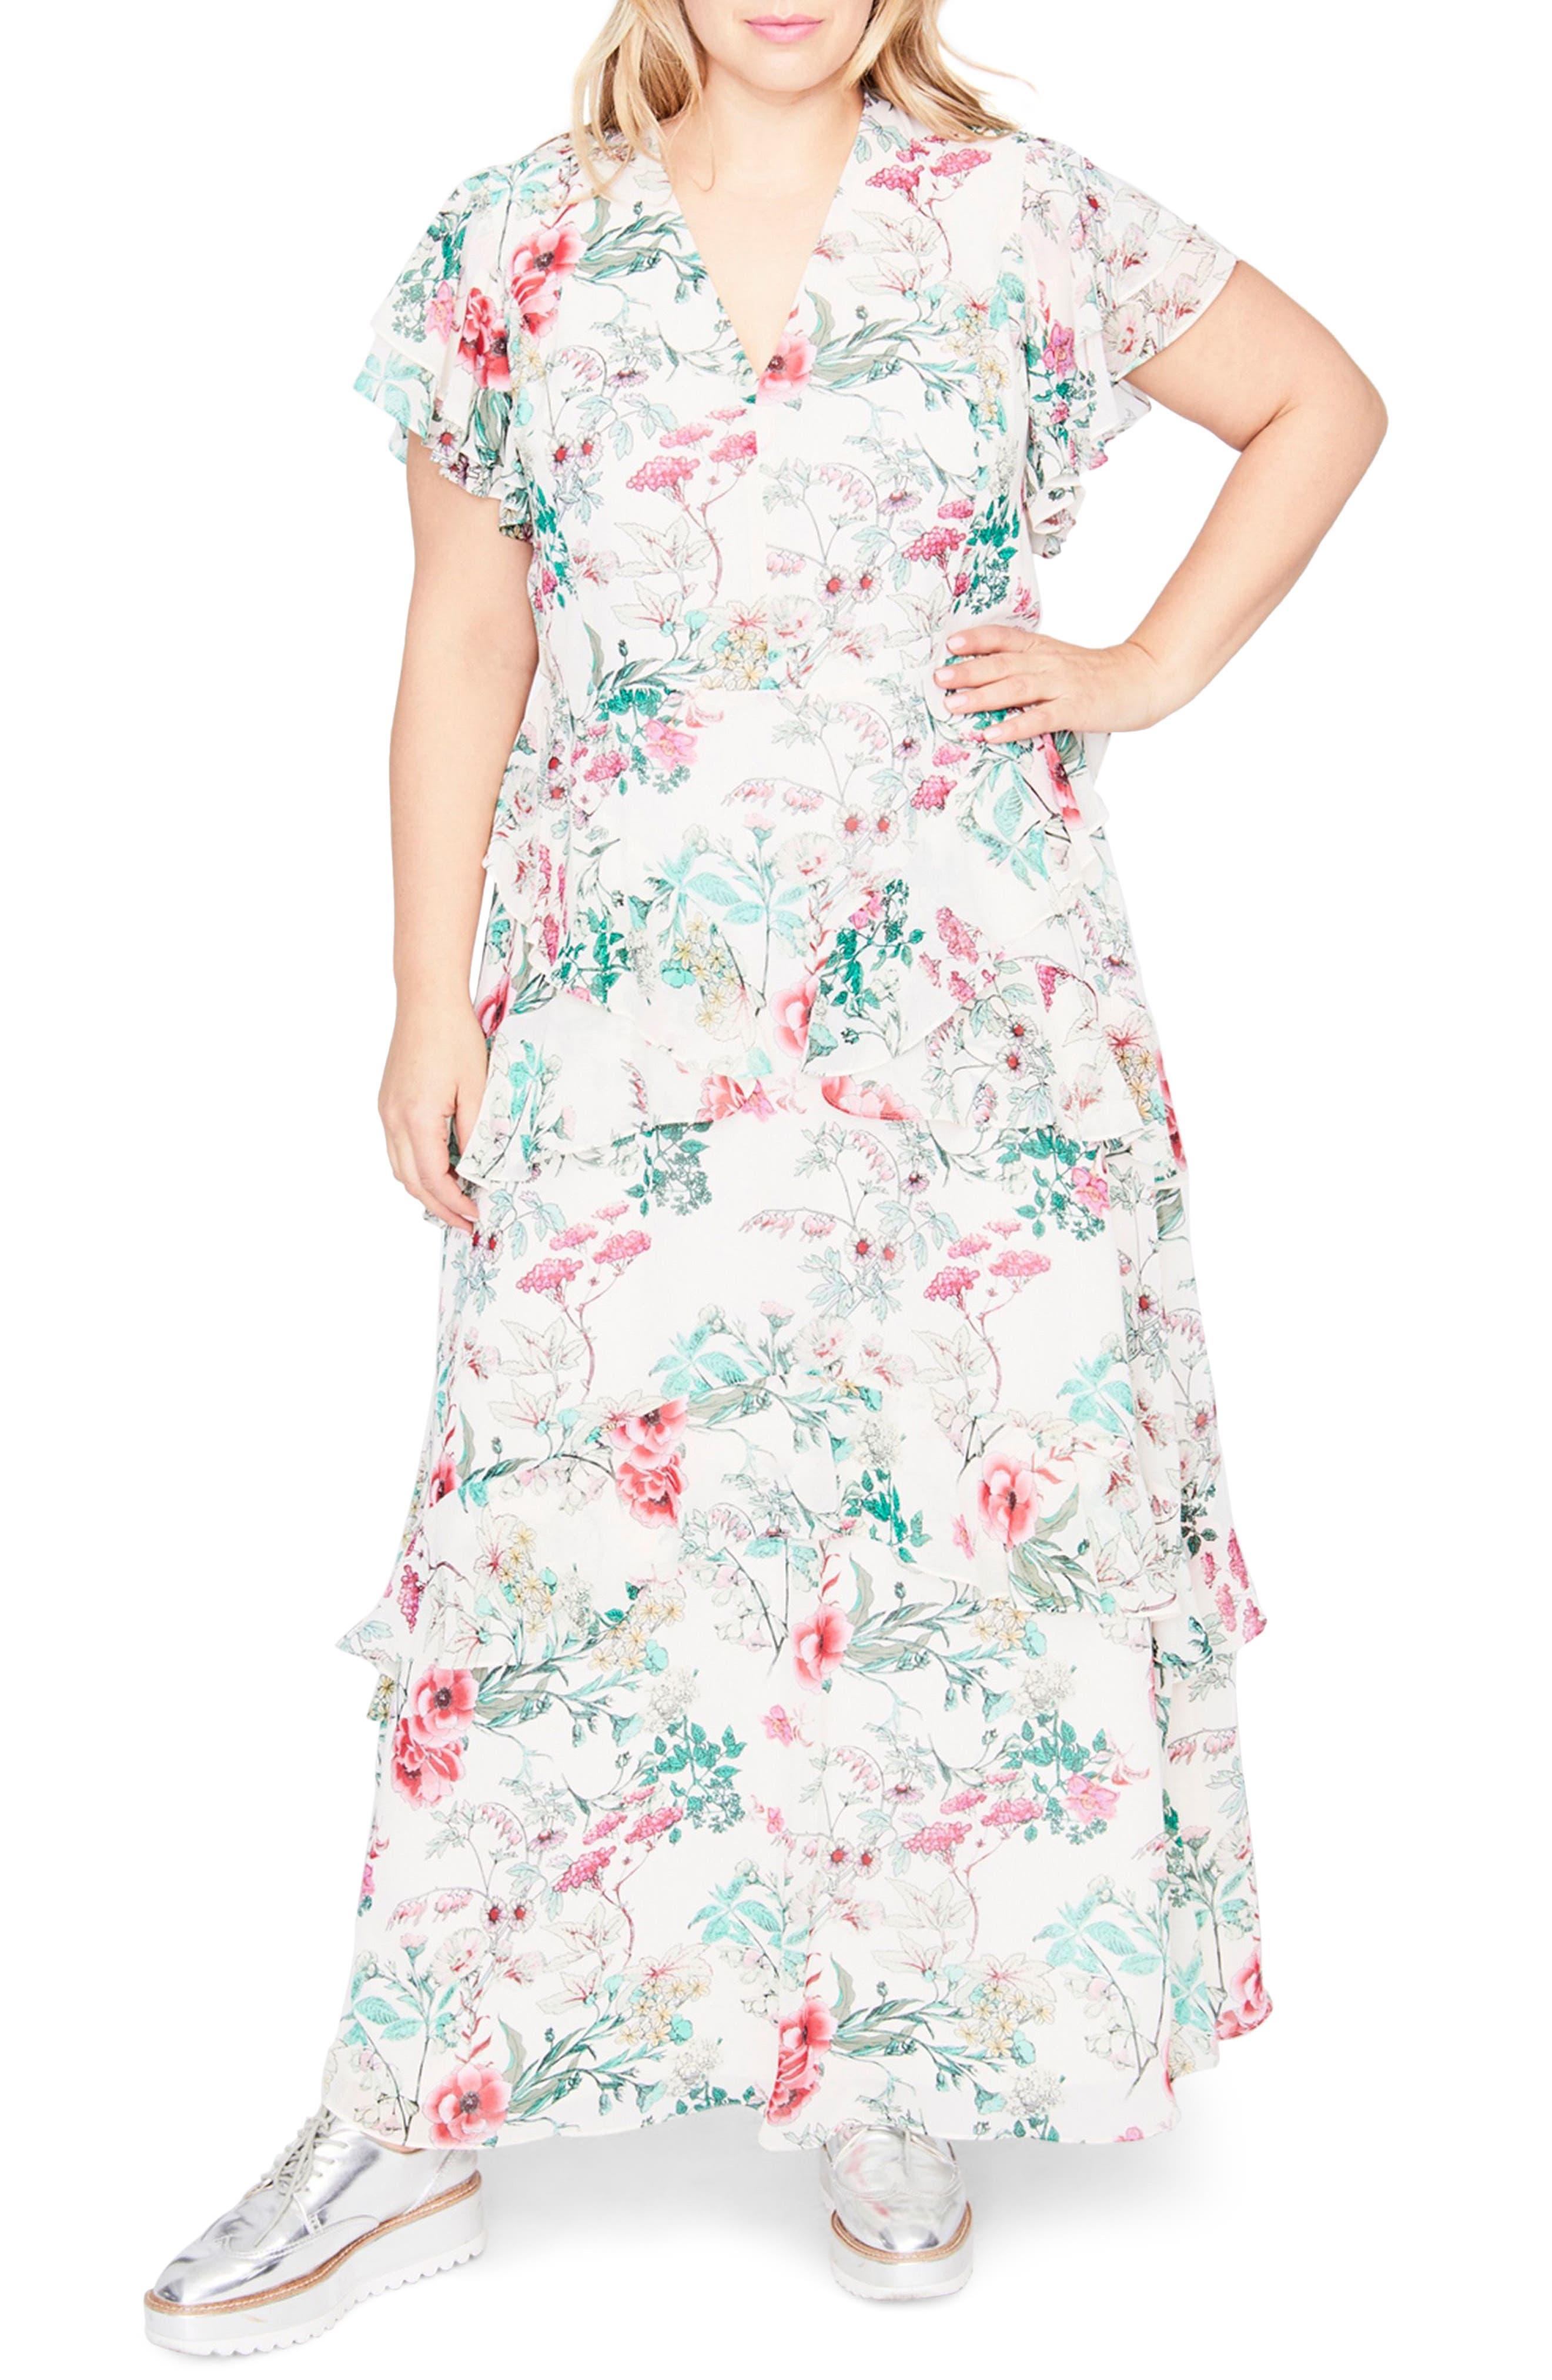 Ruffle Floral Maxi Dress,                             Main thumbnail 1, color,                             908